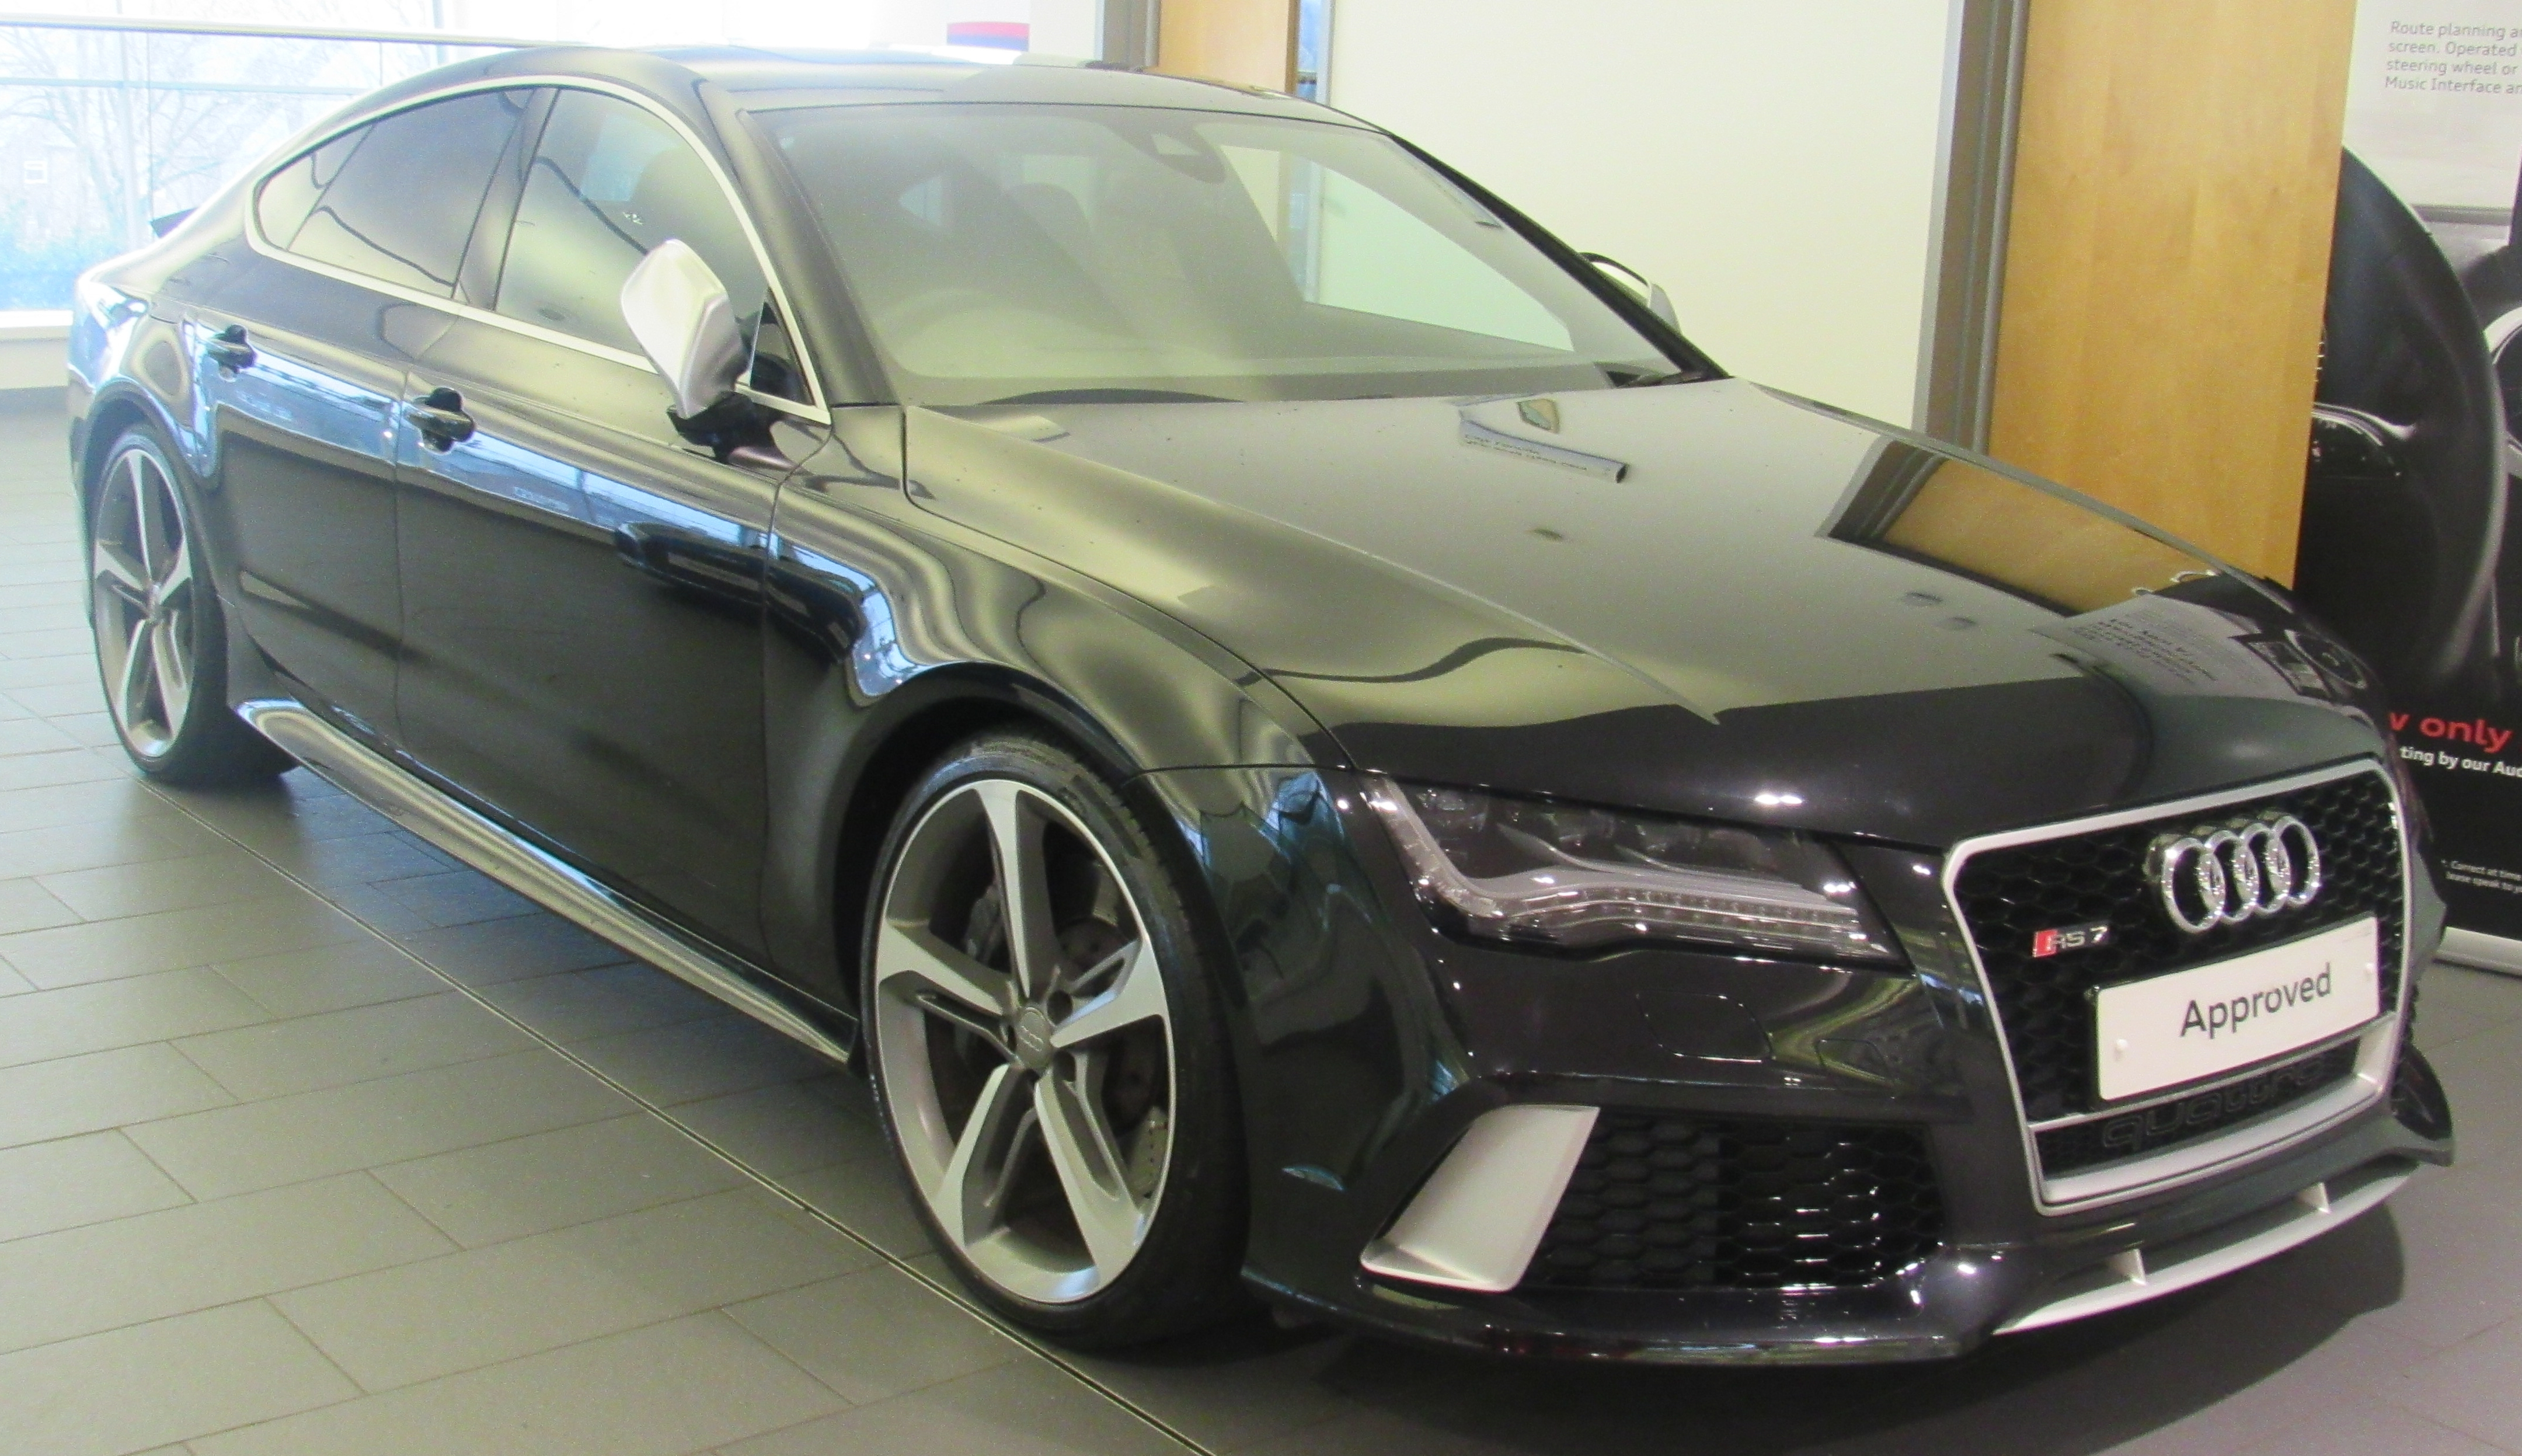 Kelebihan Kekurangan Audi Rs7 Quattro Review